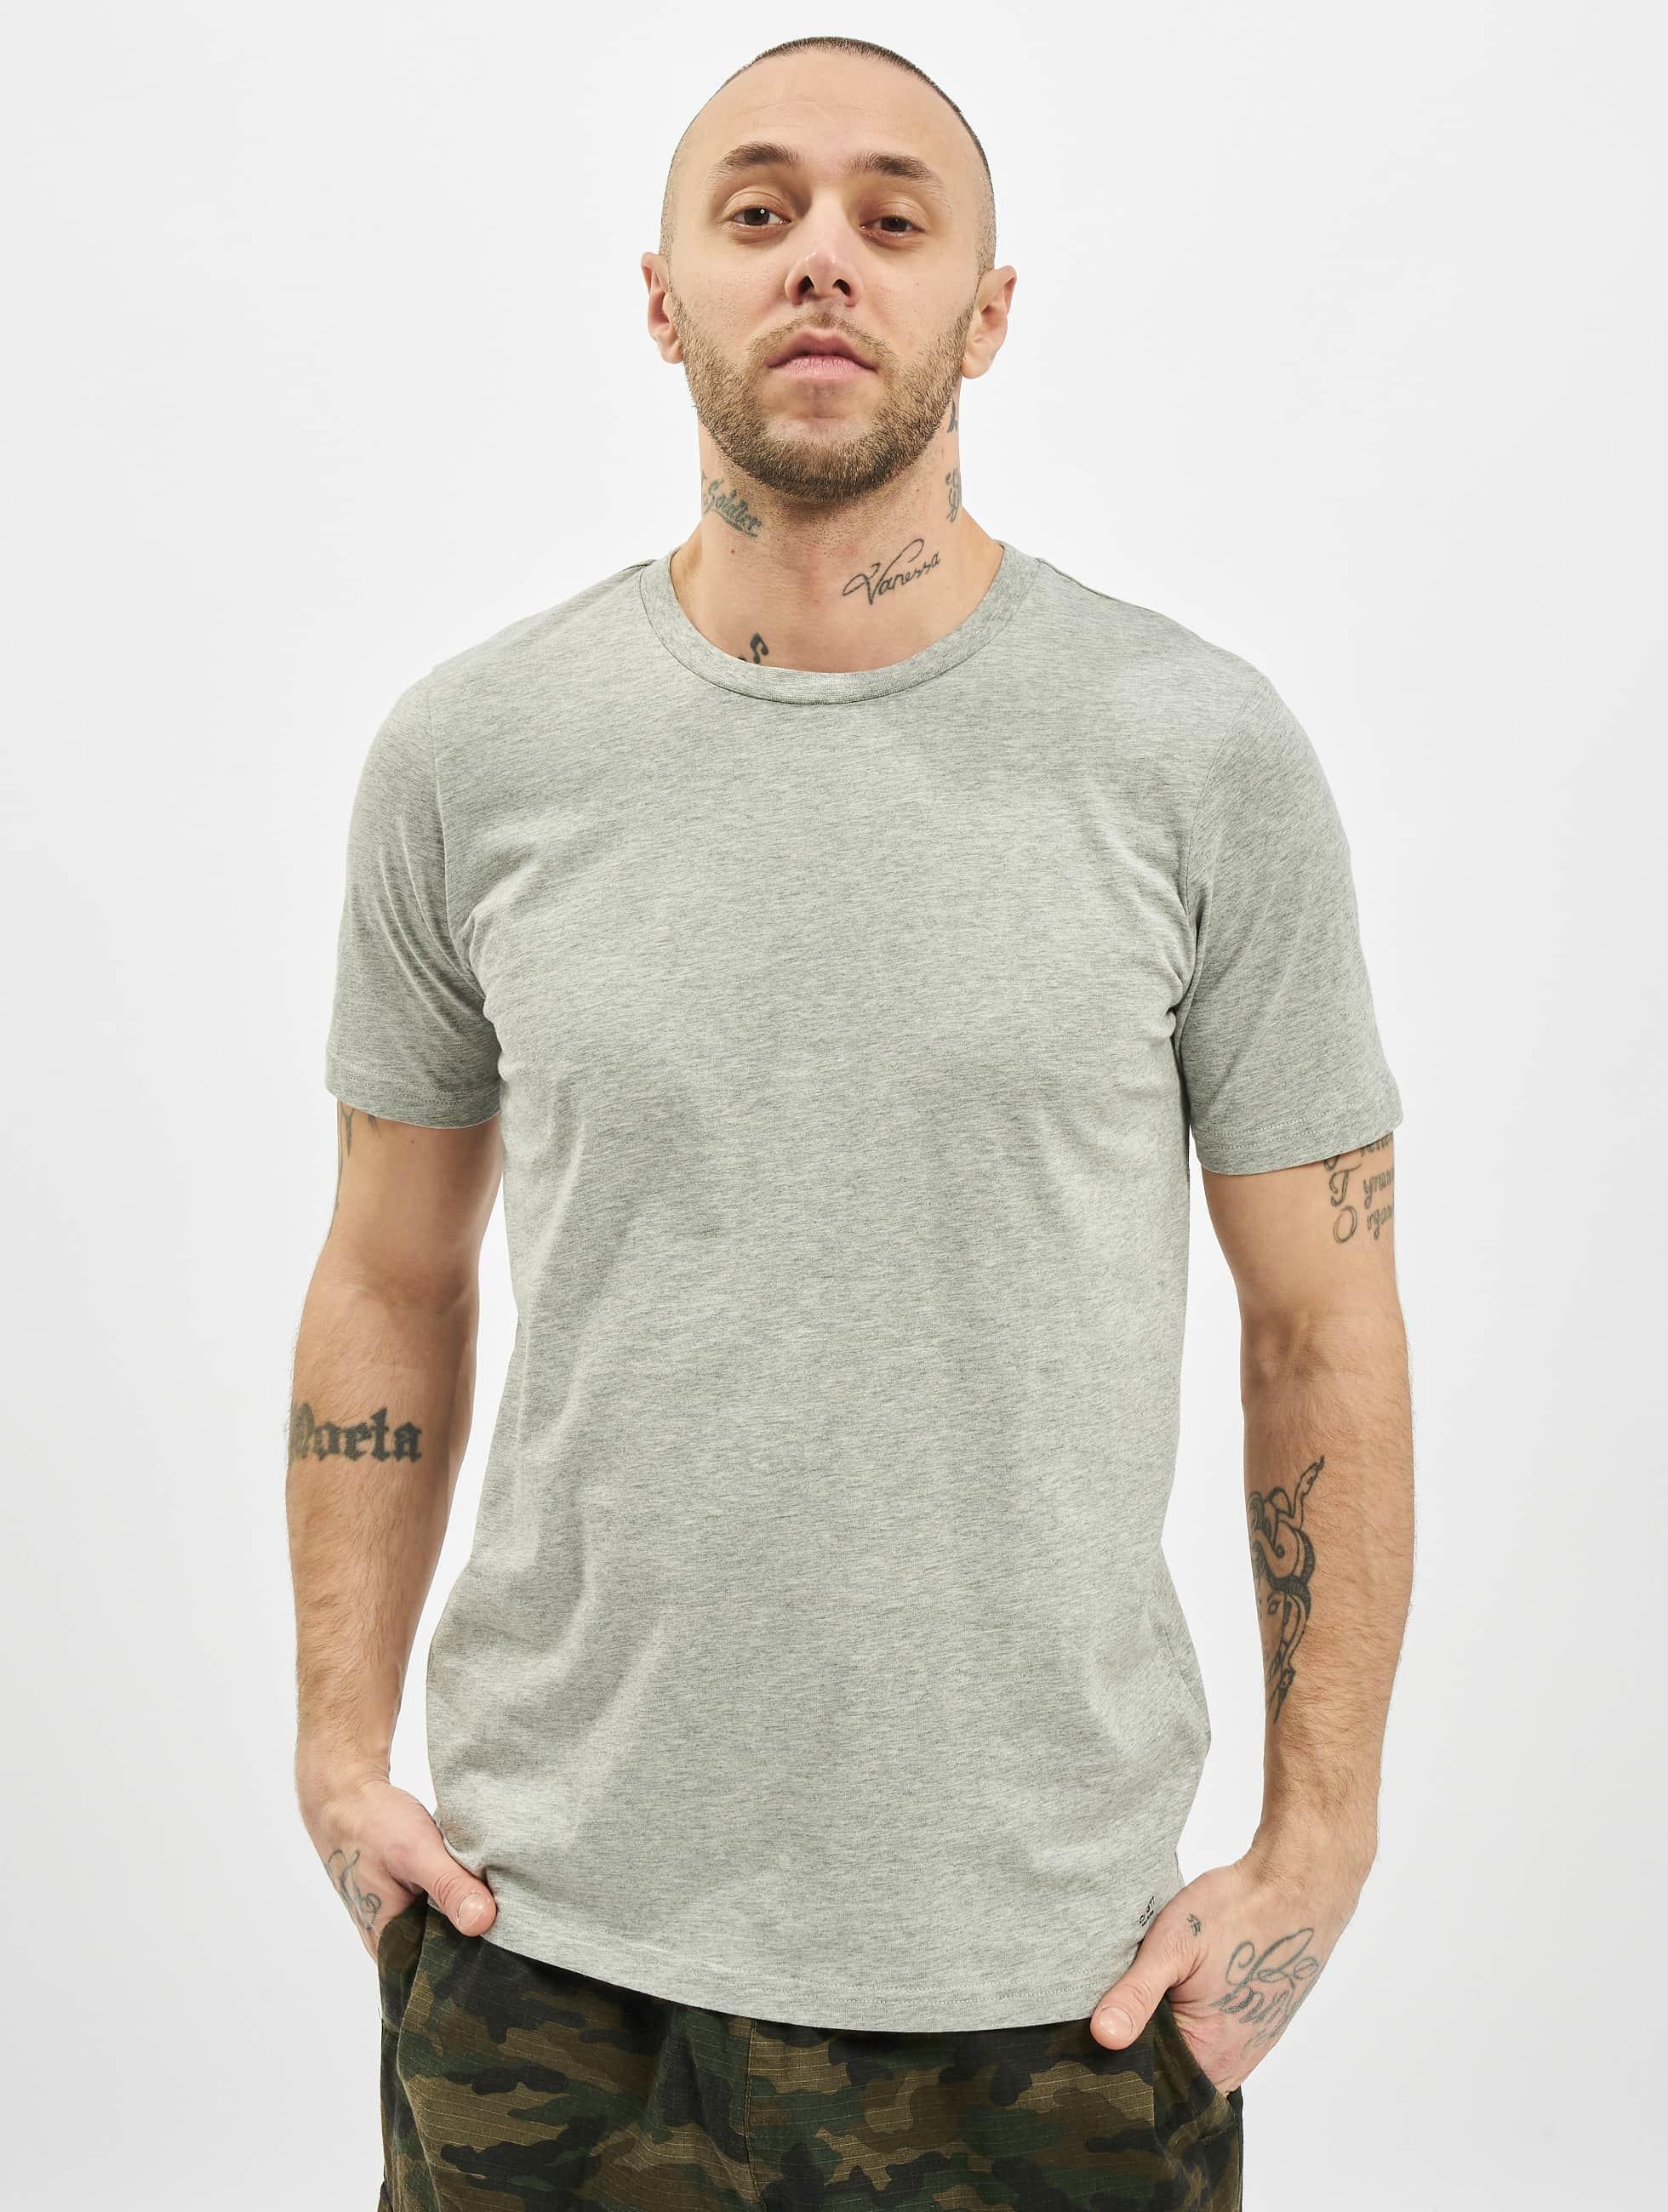 Carhartt WIP T-Shirt Standard Crew Neck white